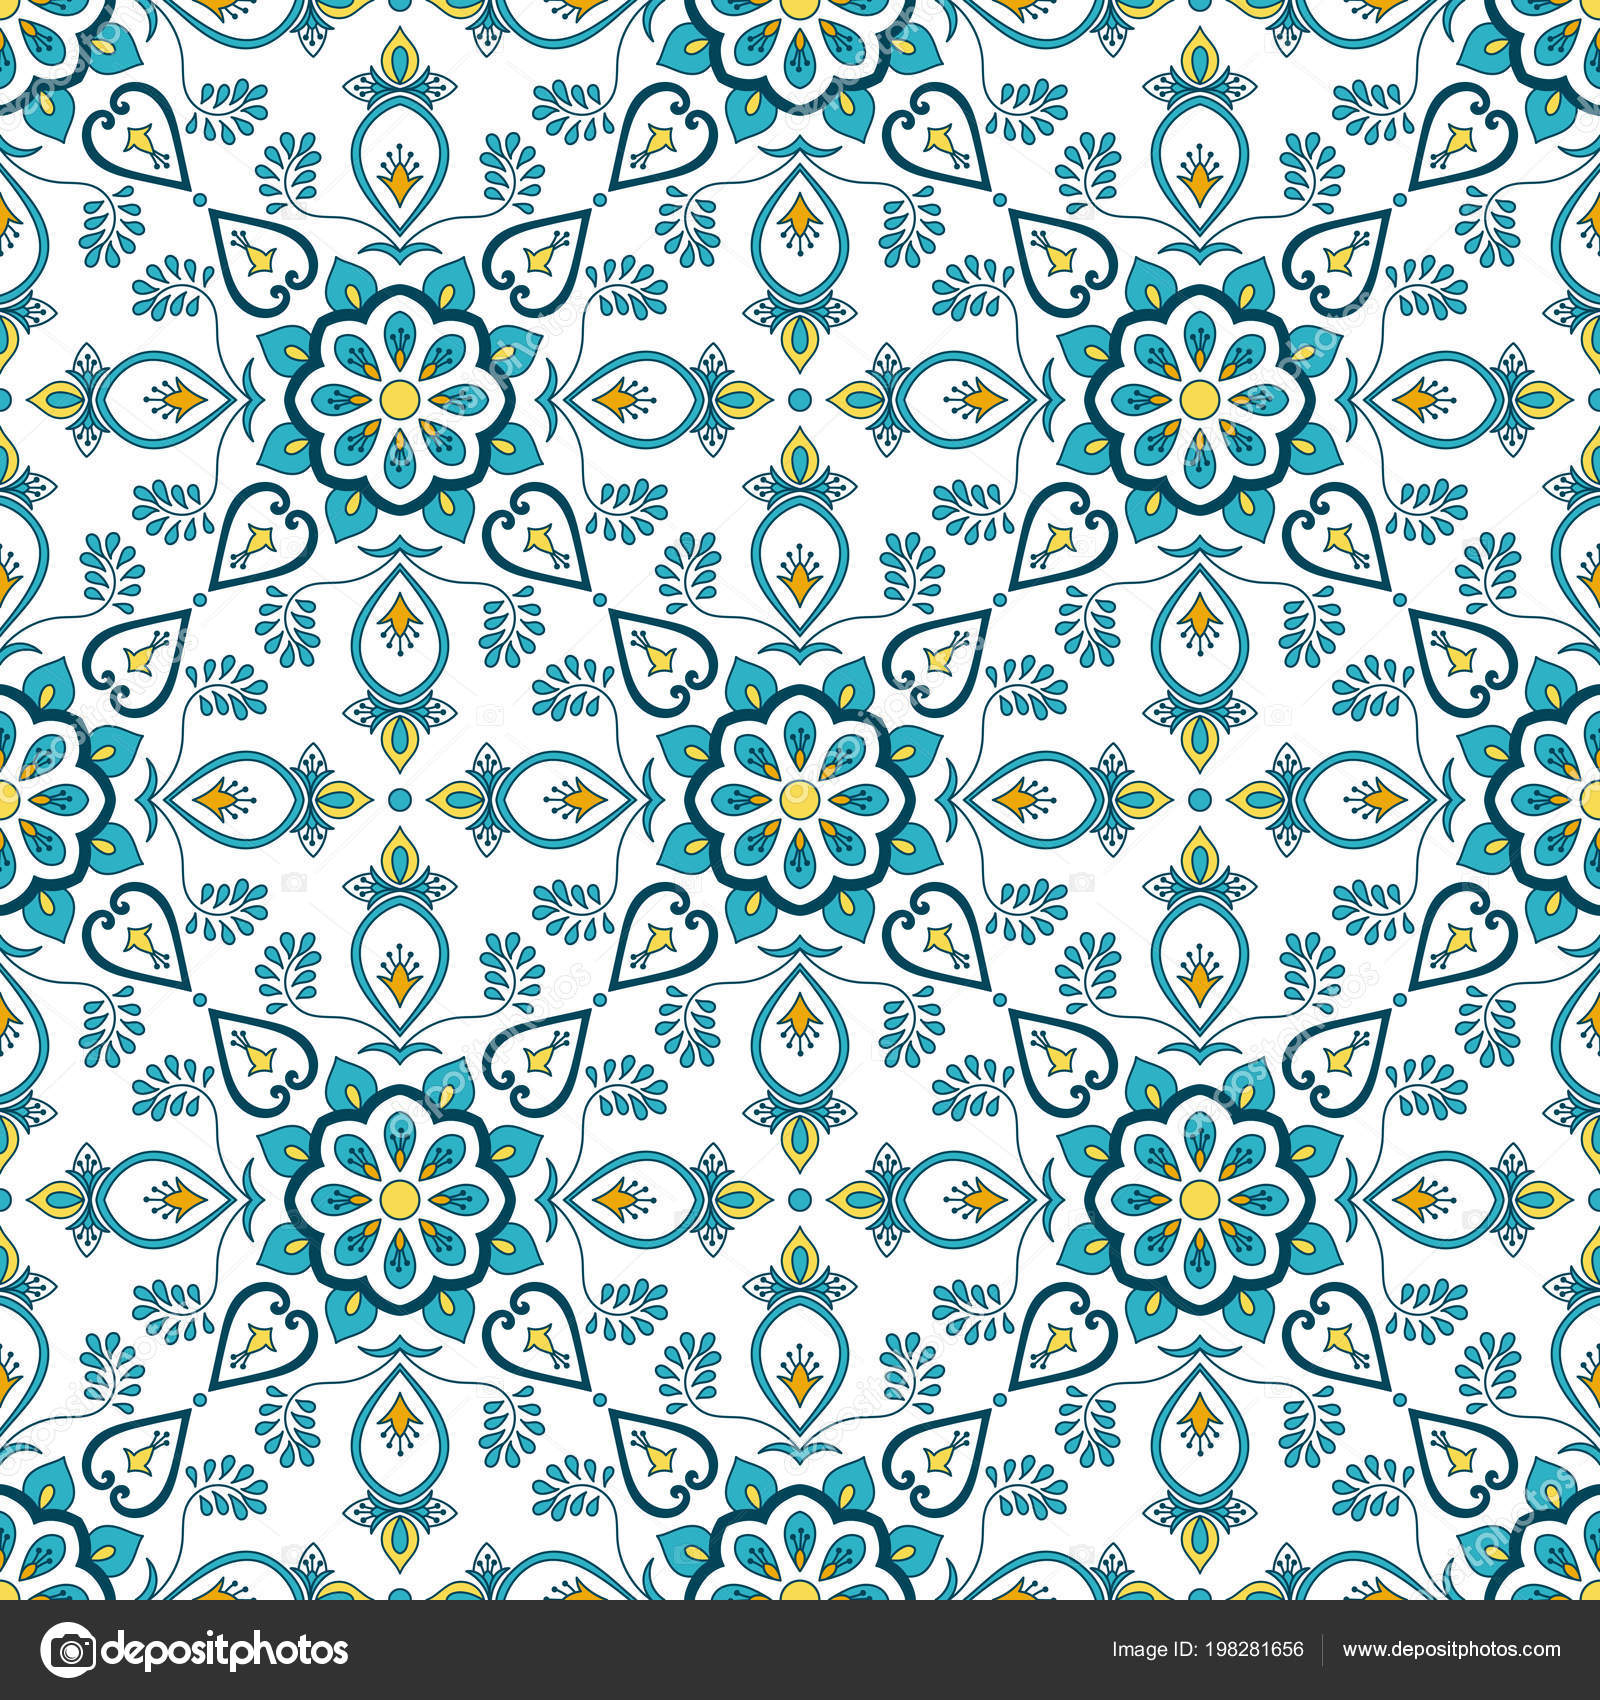 Portugiesische Fliesen Muster Vektor Nahtlos Mit Blumenornamente - Portugiesische fliesen küche